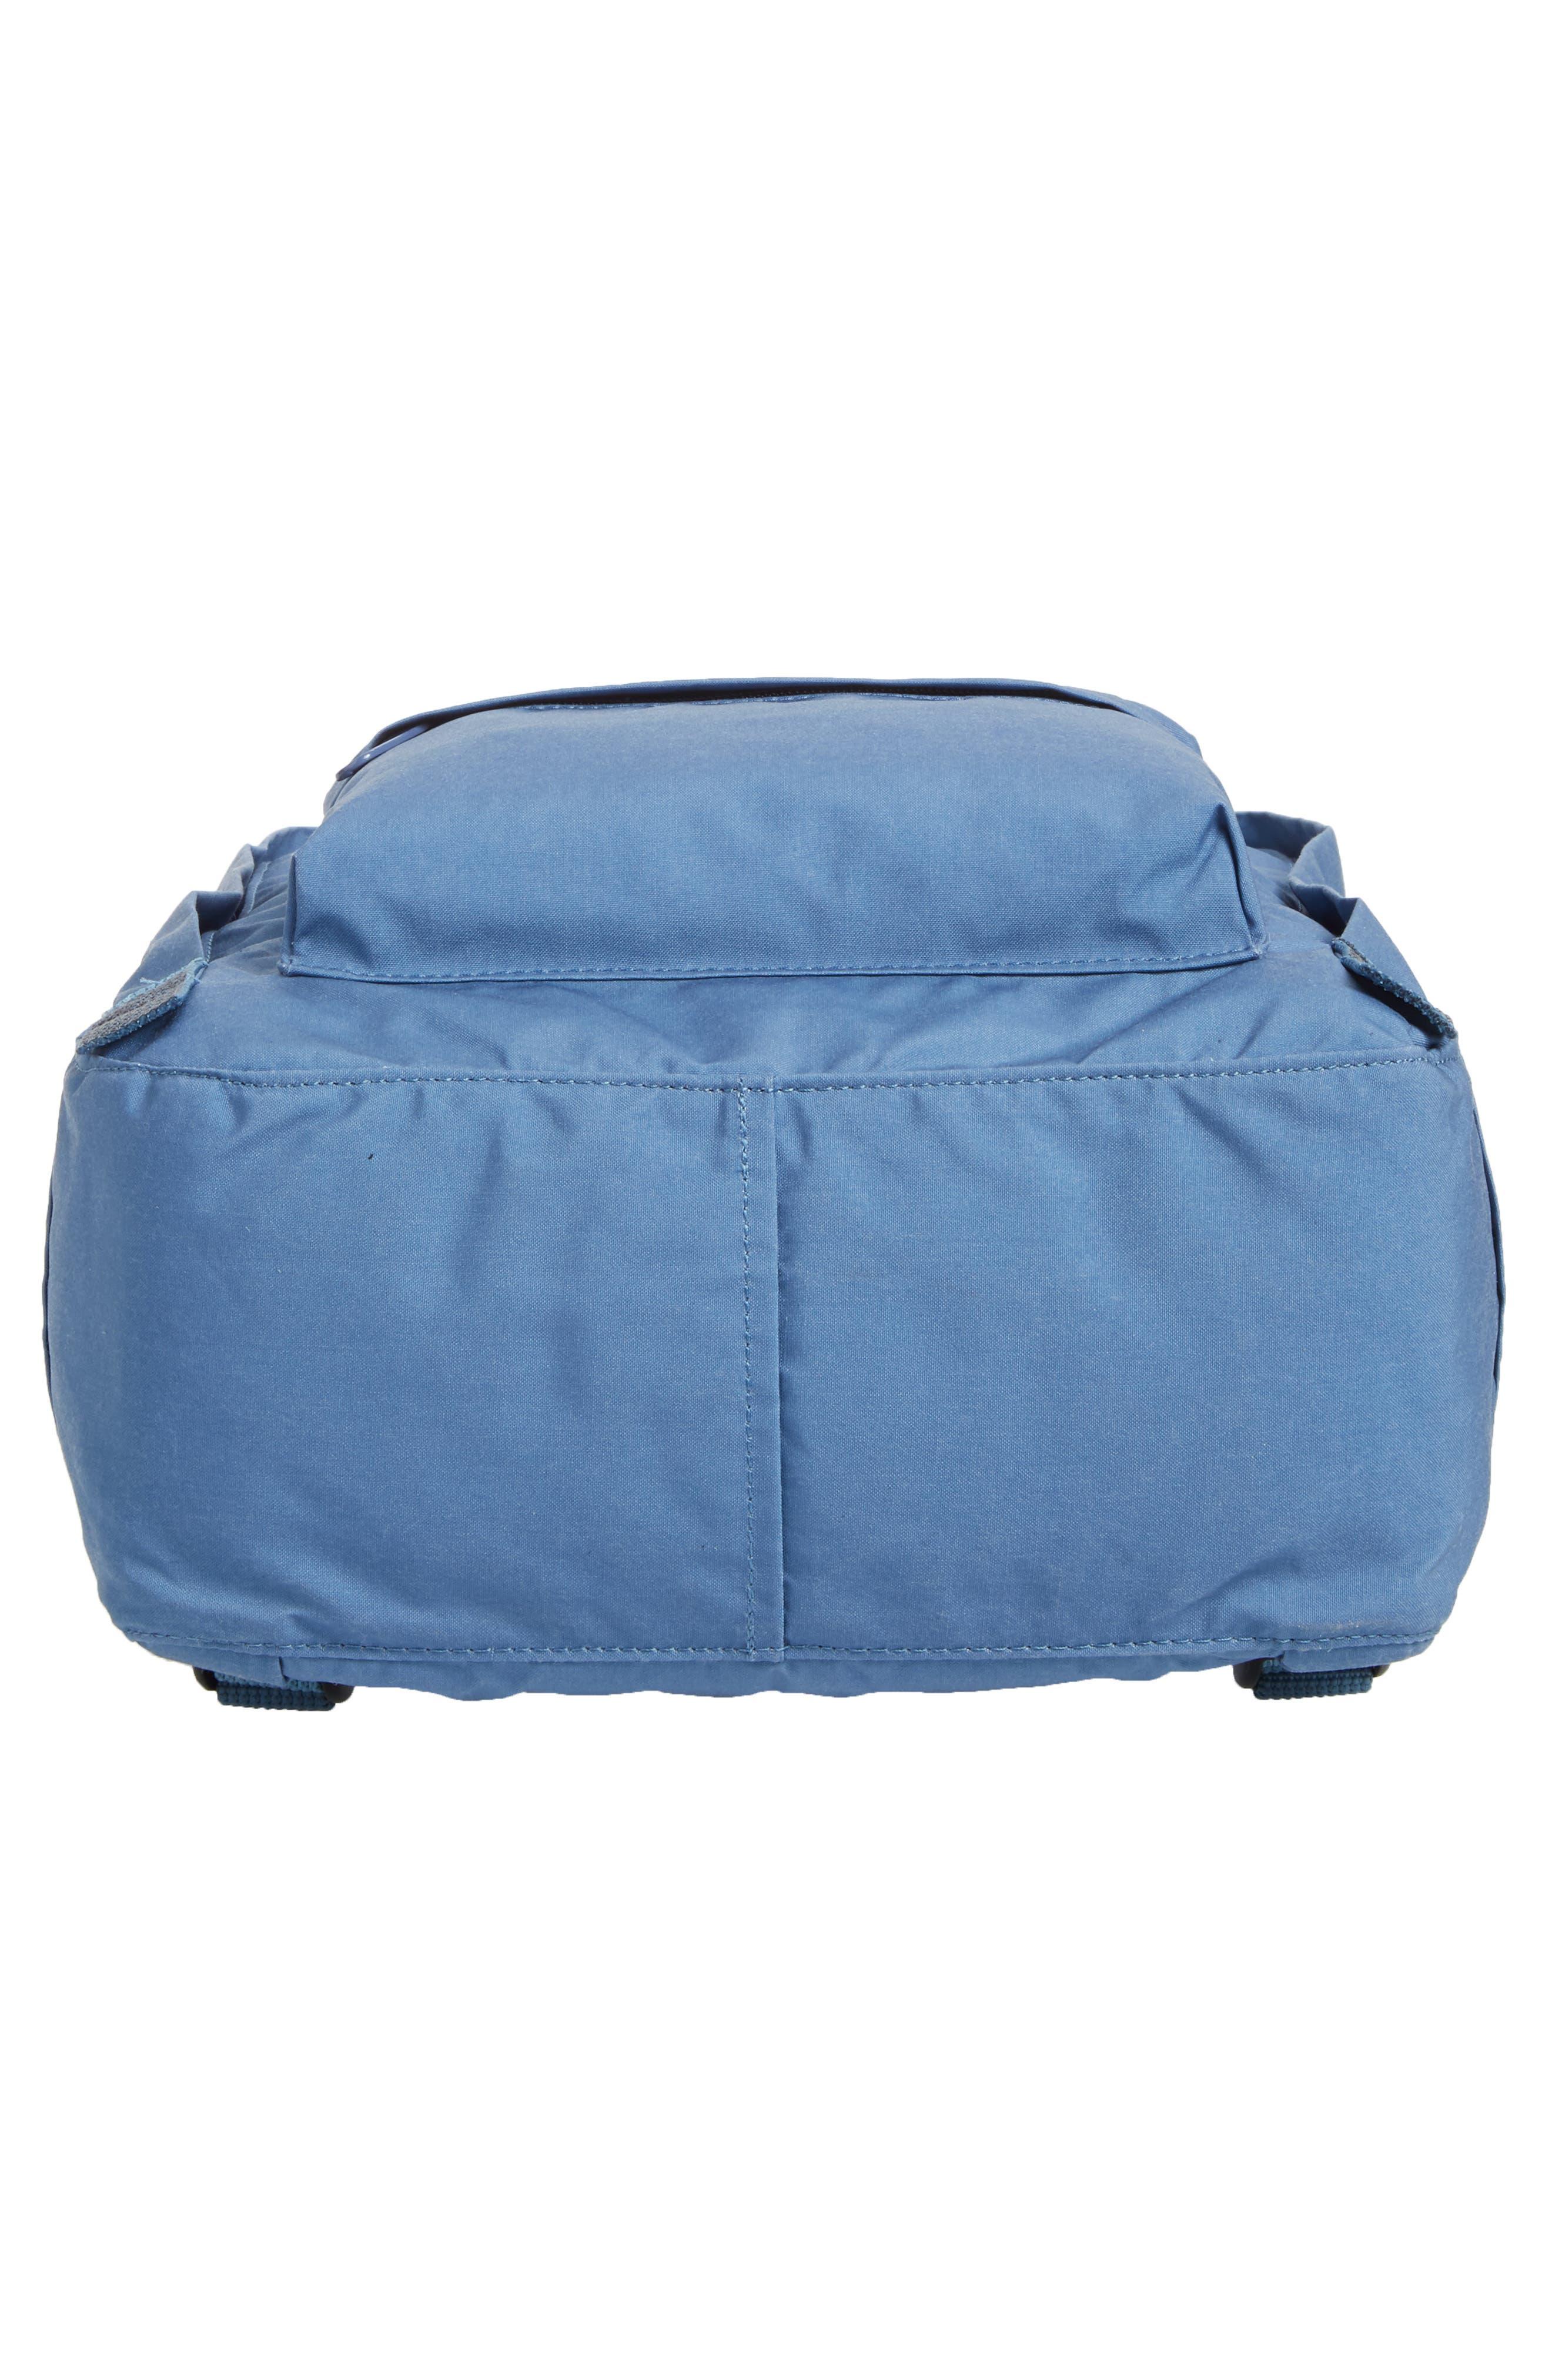 'Kånken' Water Resistant Backpack,                             Alternate thumbnail 301, color,